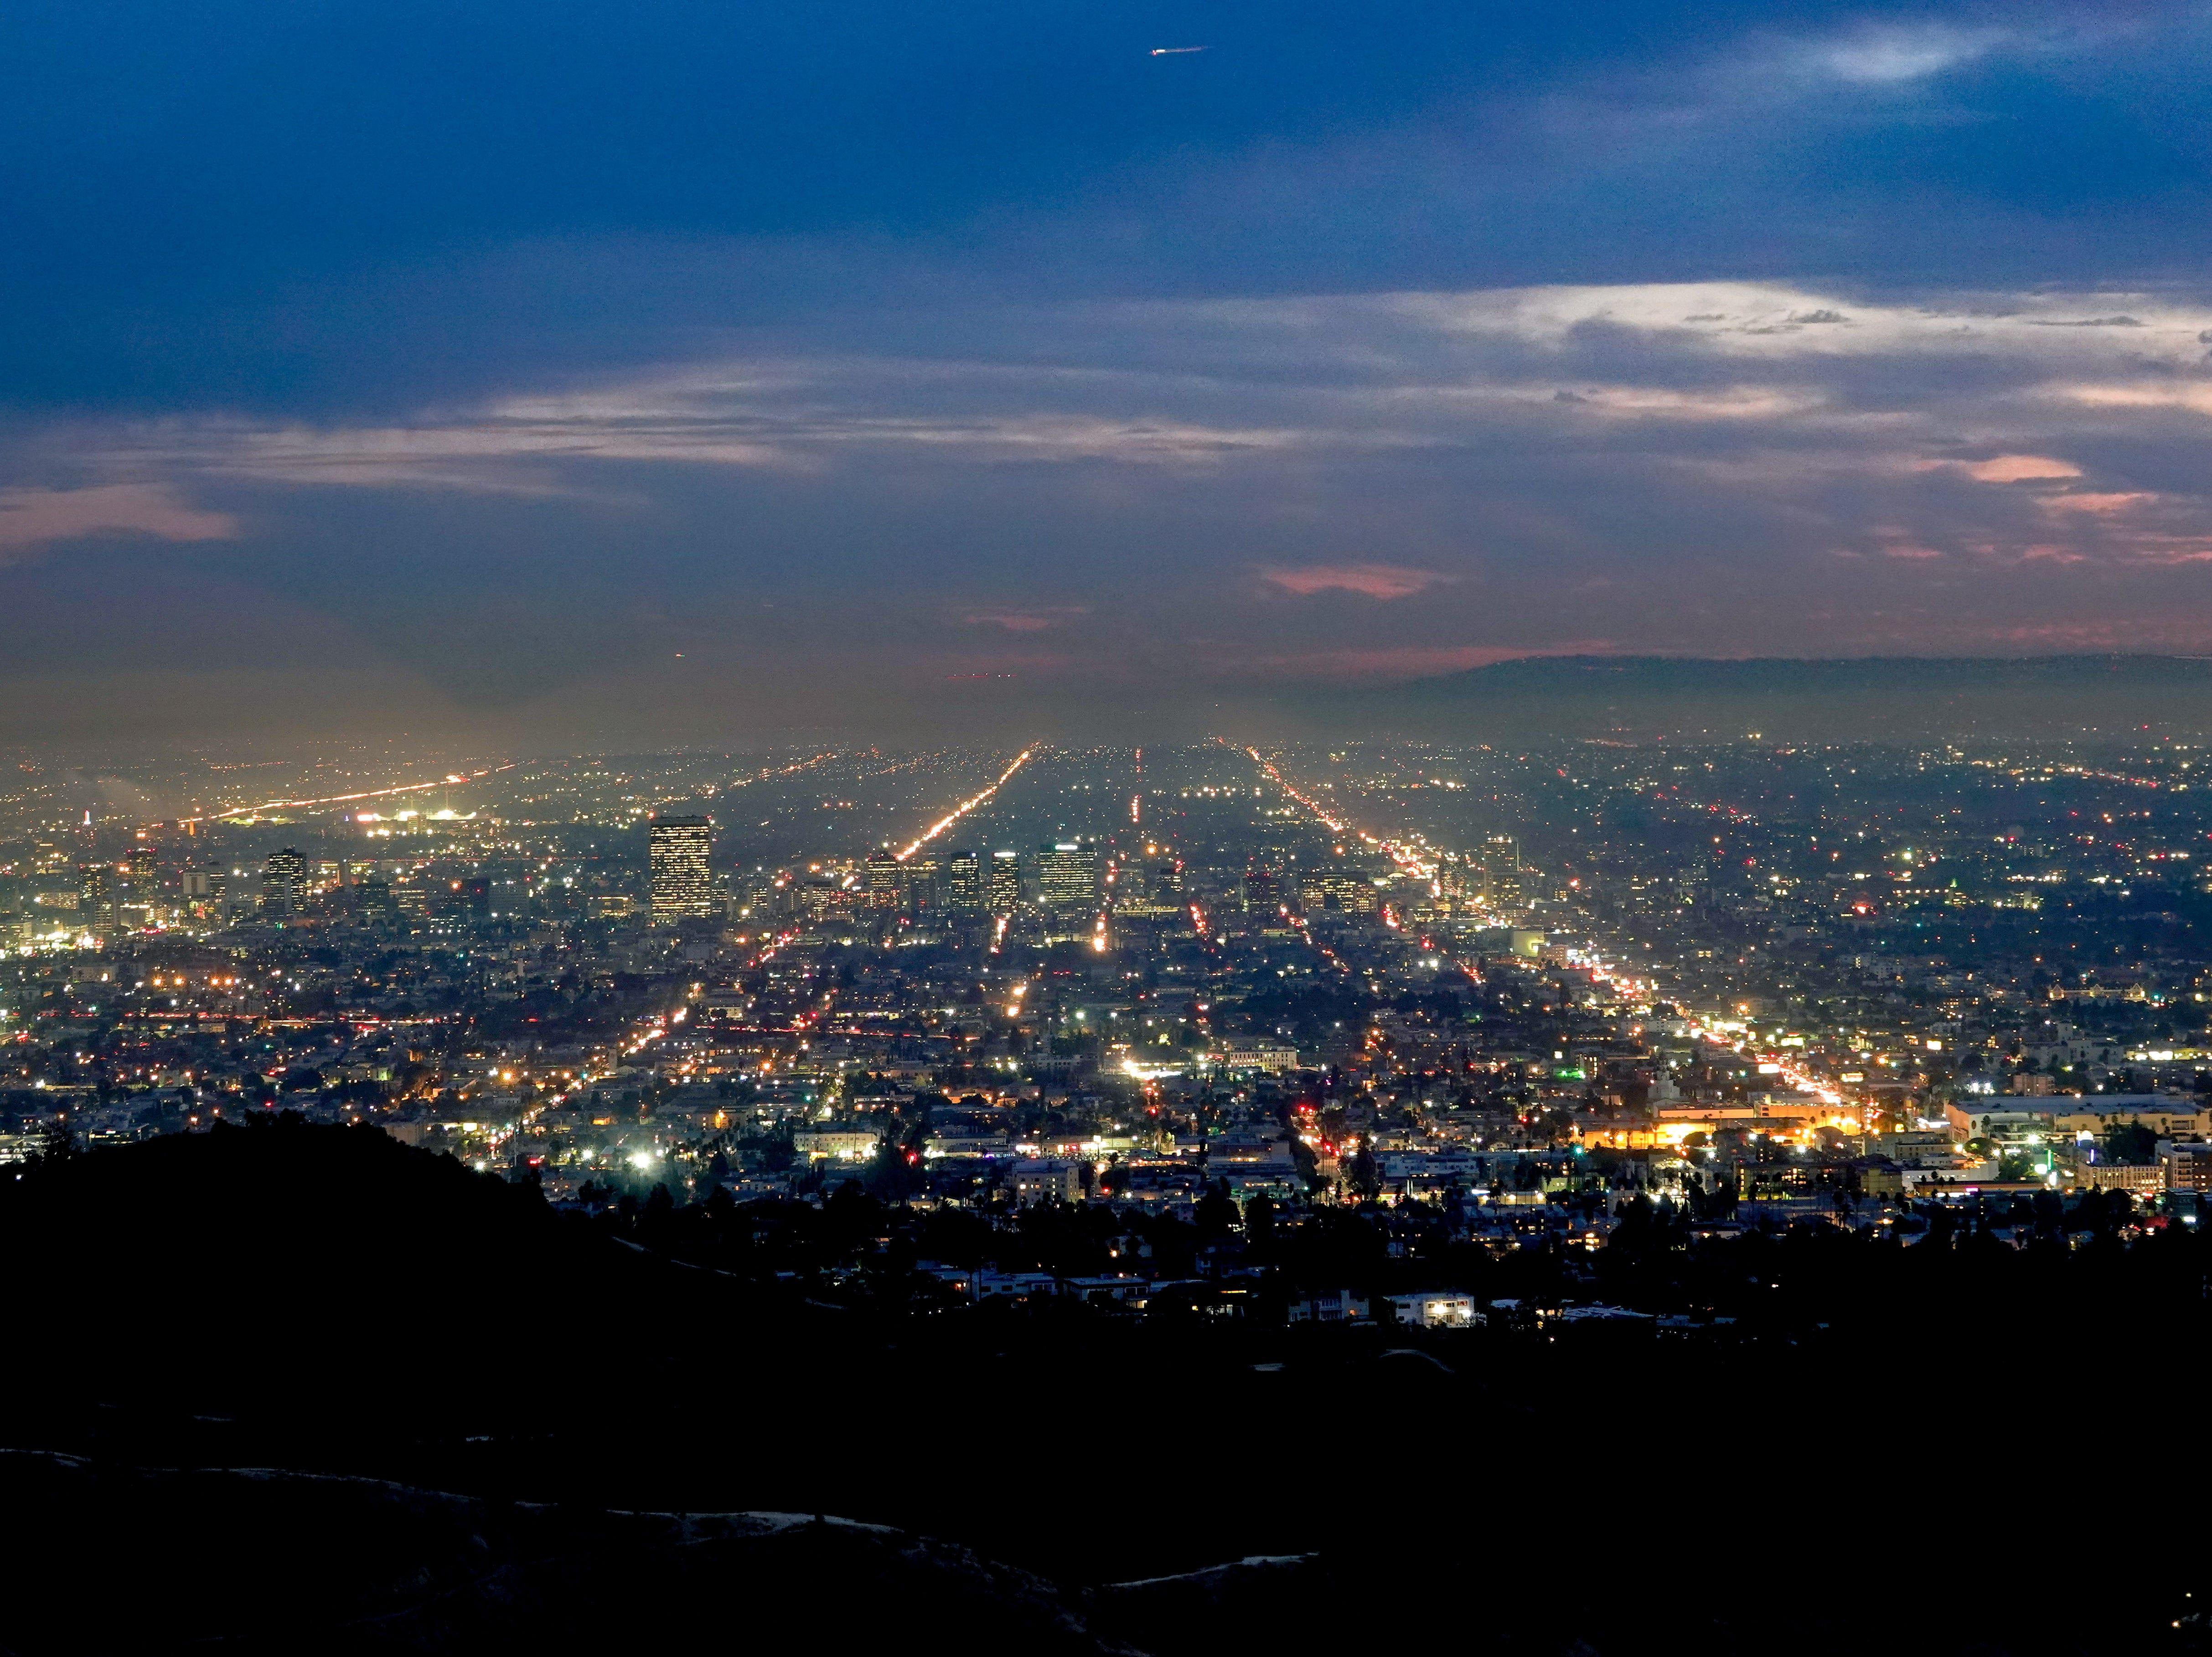 Los Angeles skyline at night.